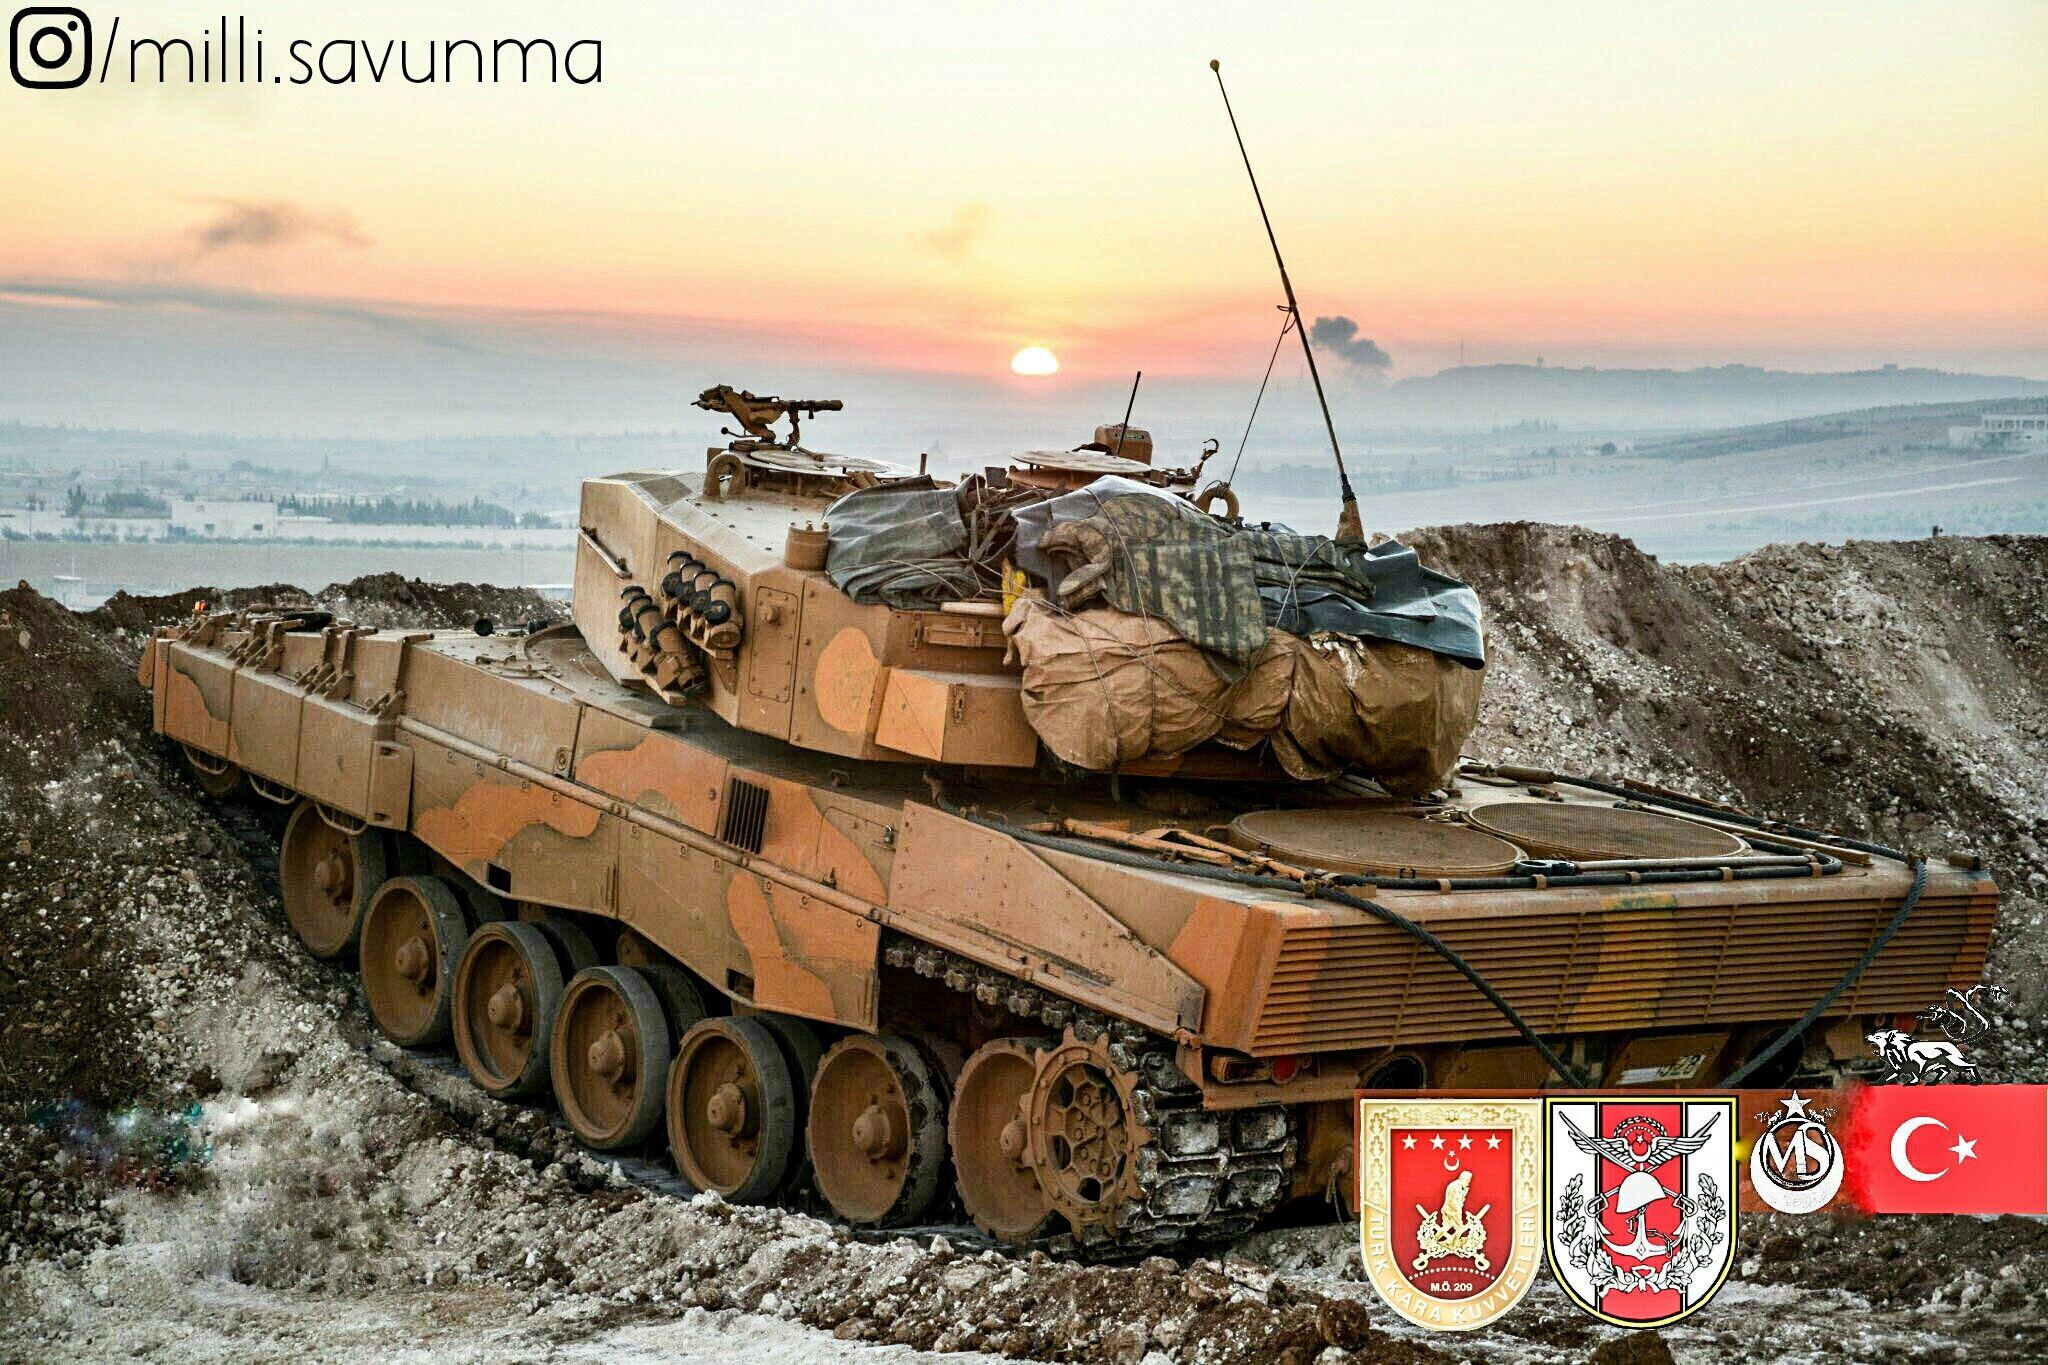 7196e84ffc3e Turkish leopard 2A4 main battle tank in Syria-El bab Operation Euphrates  Shield Türk ana savaş tankı leopard 2A4 Suriye-El bab Fırat Kalkanı  Operasyonu